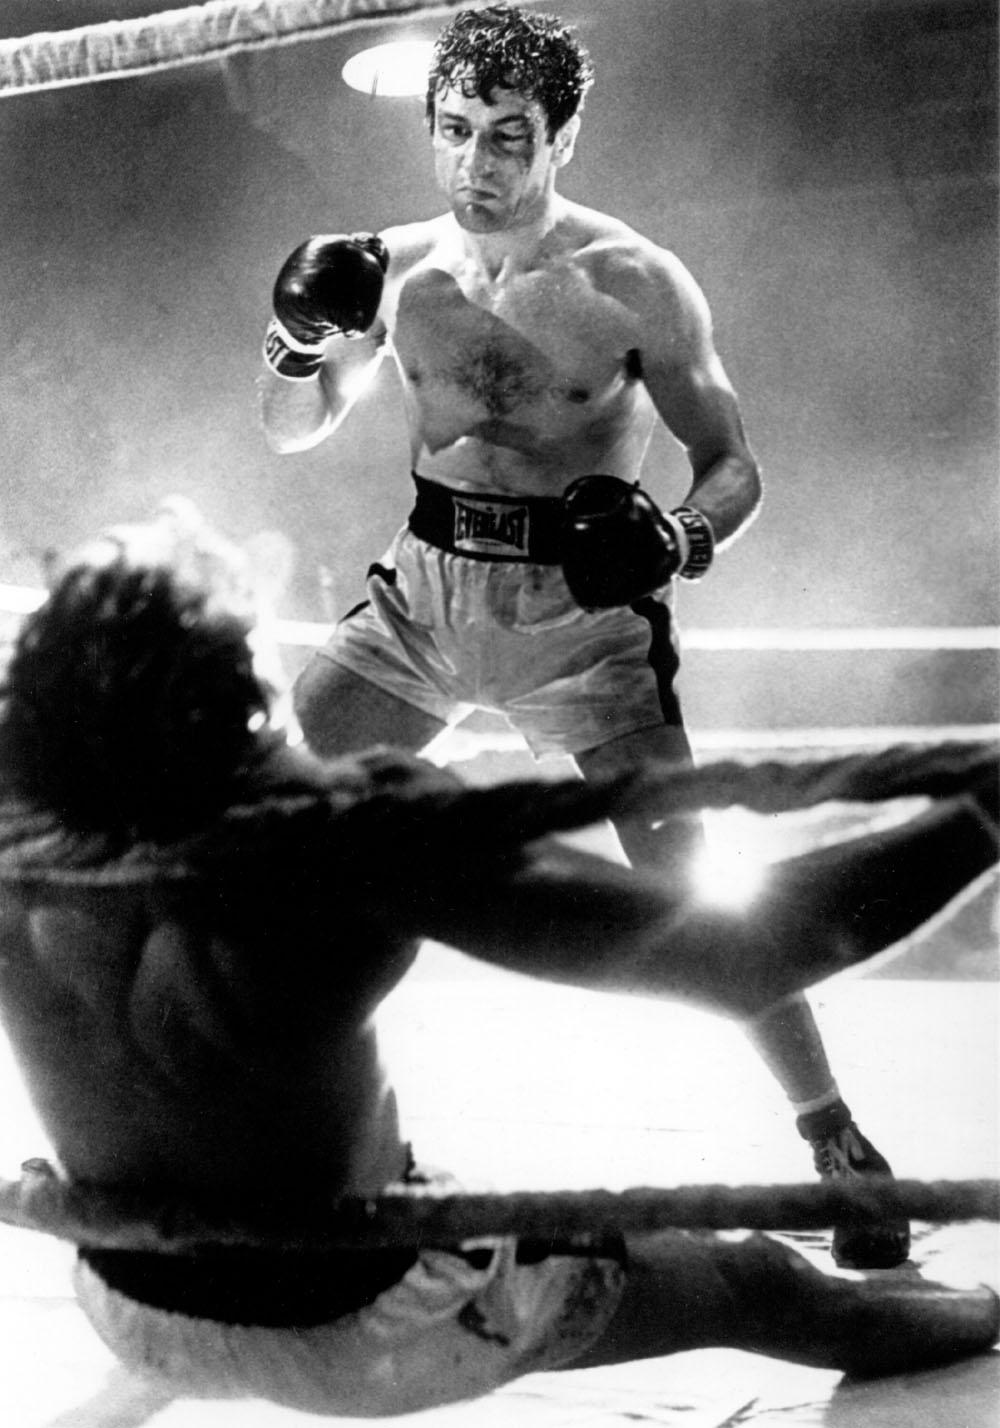 Raging Bull Robert De Niro Jake LaMotta